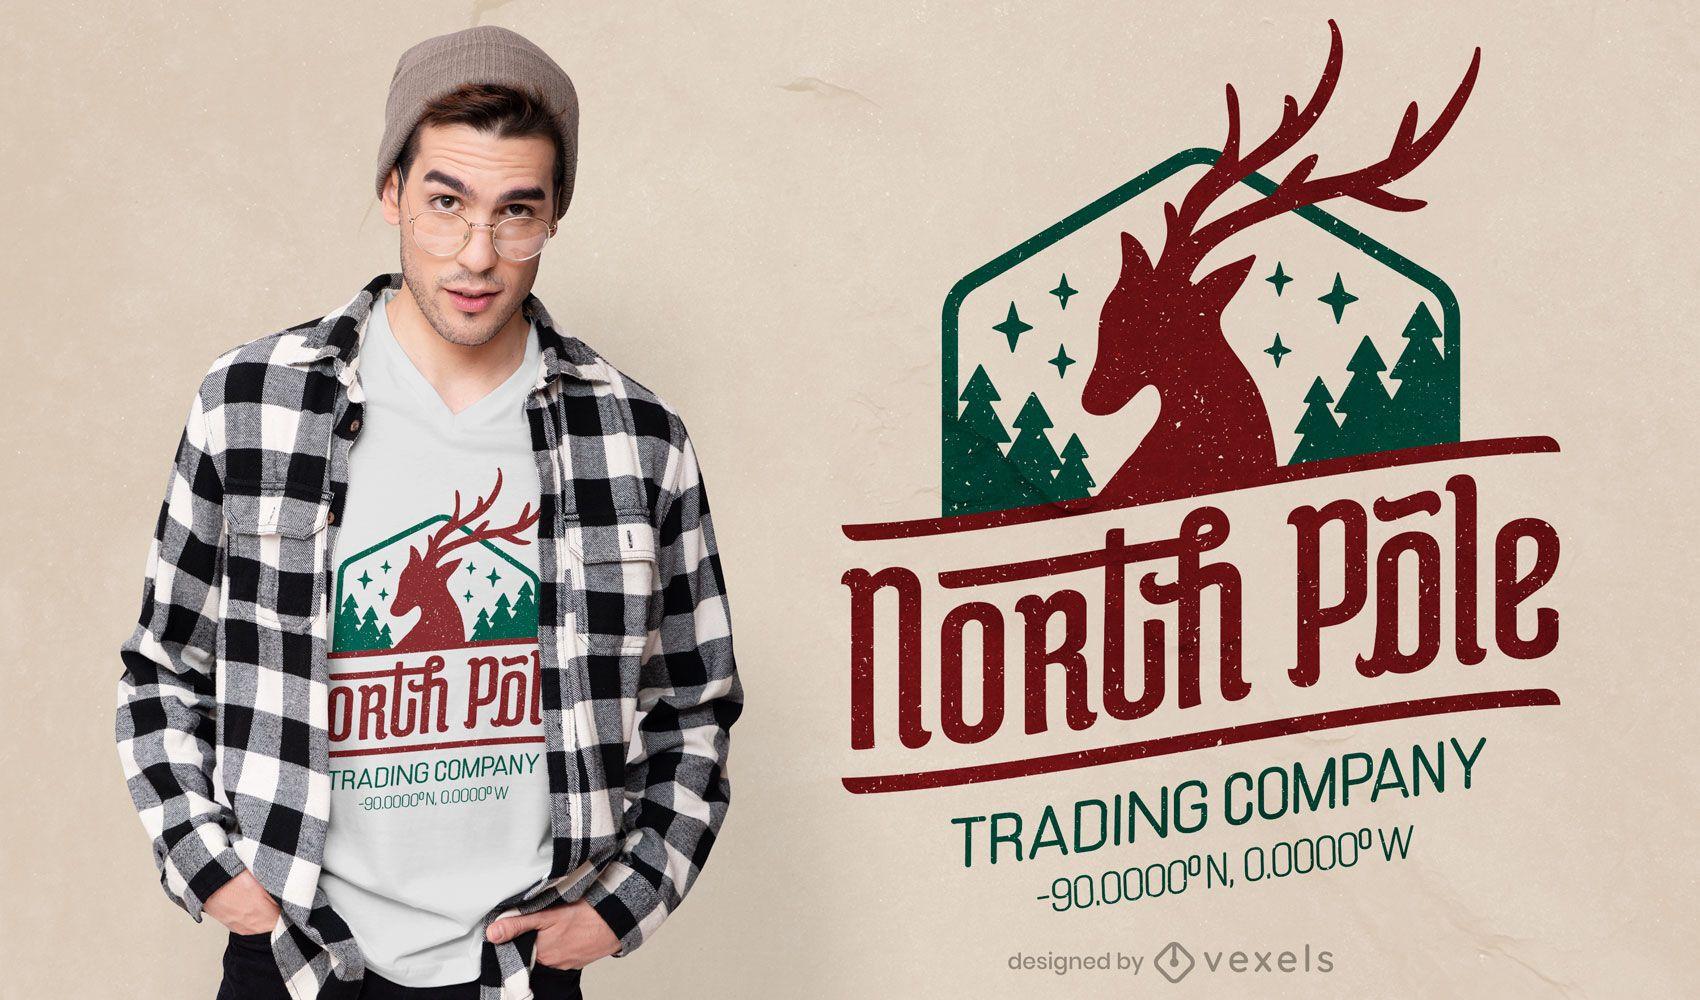 North pole trading company t-shirt design